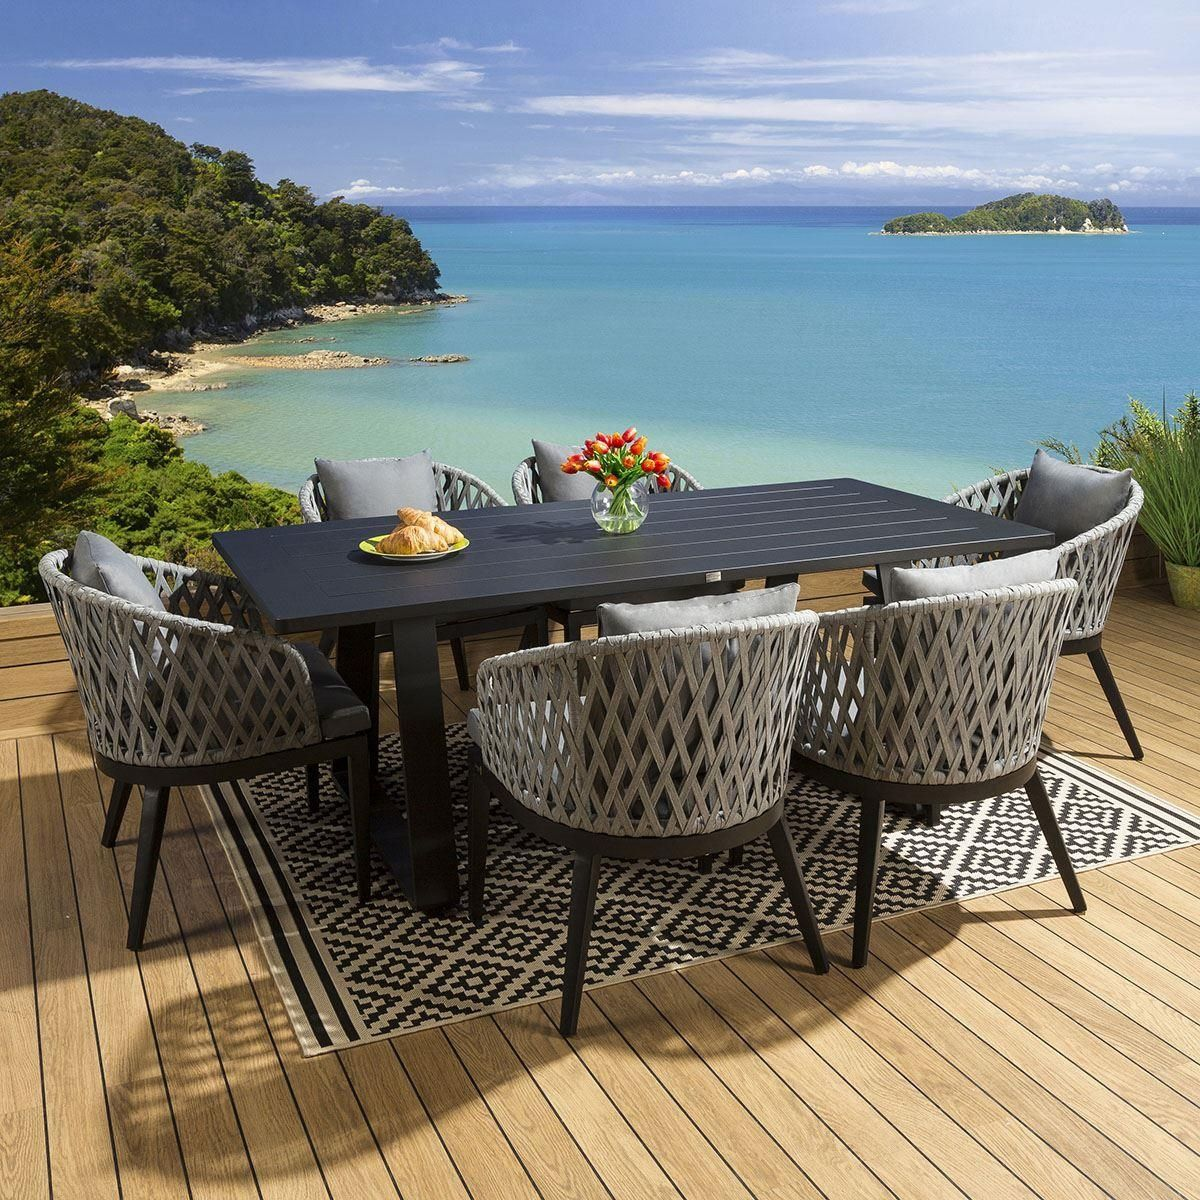 Large Garden Rectangular Alum Dining Set Table 7 Rope Chairs Black